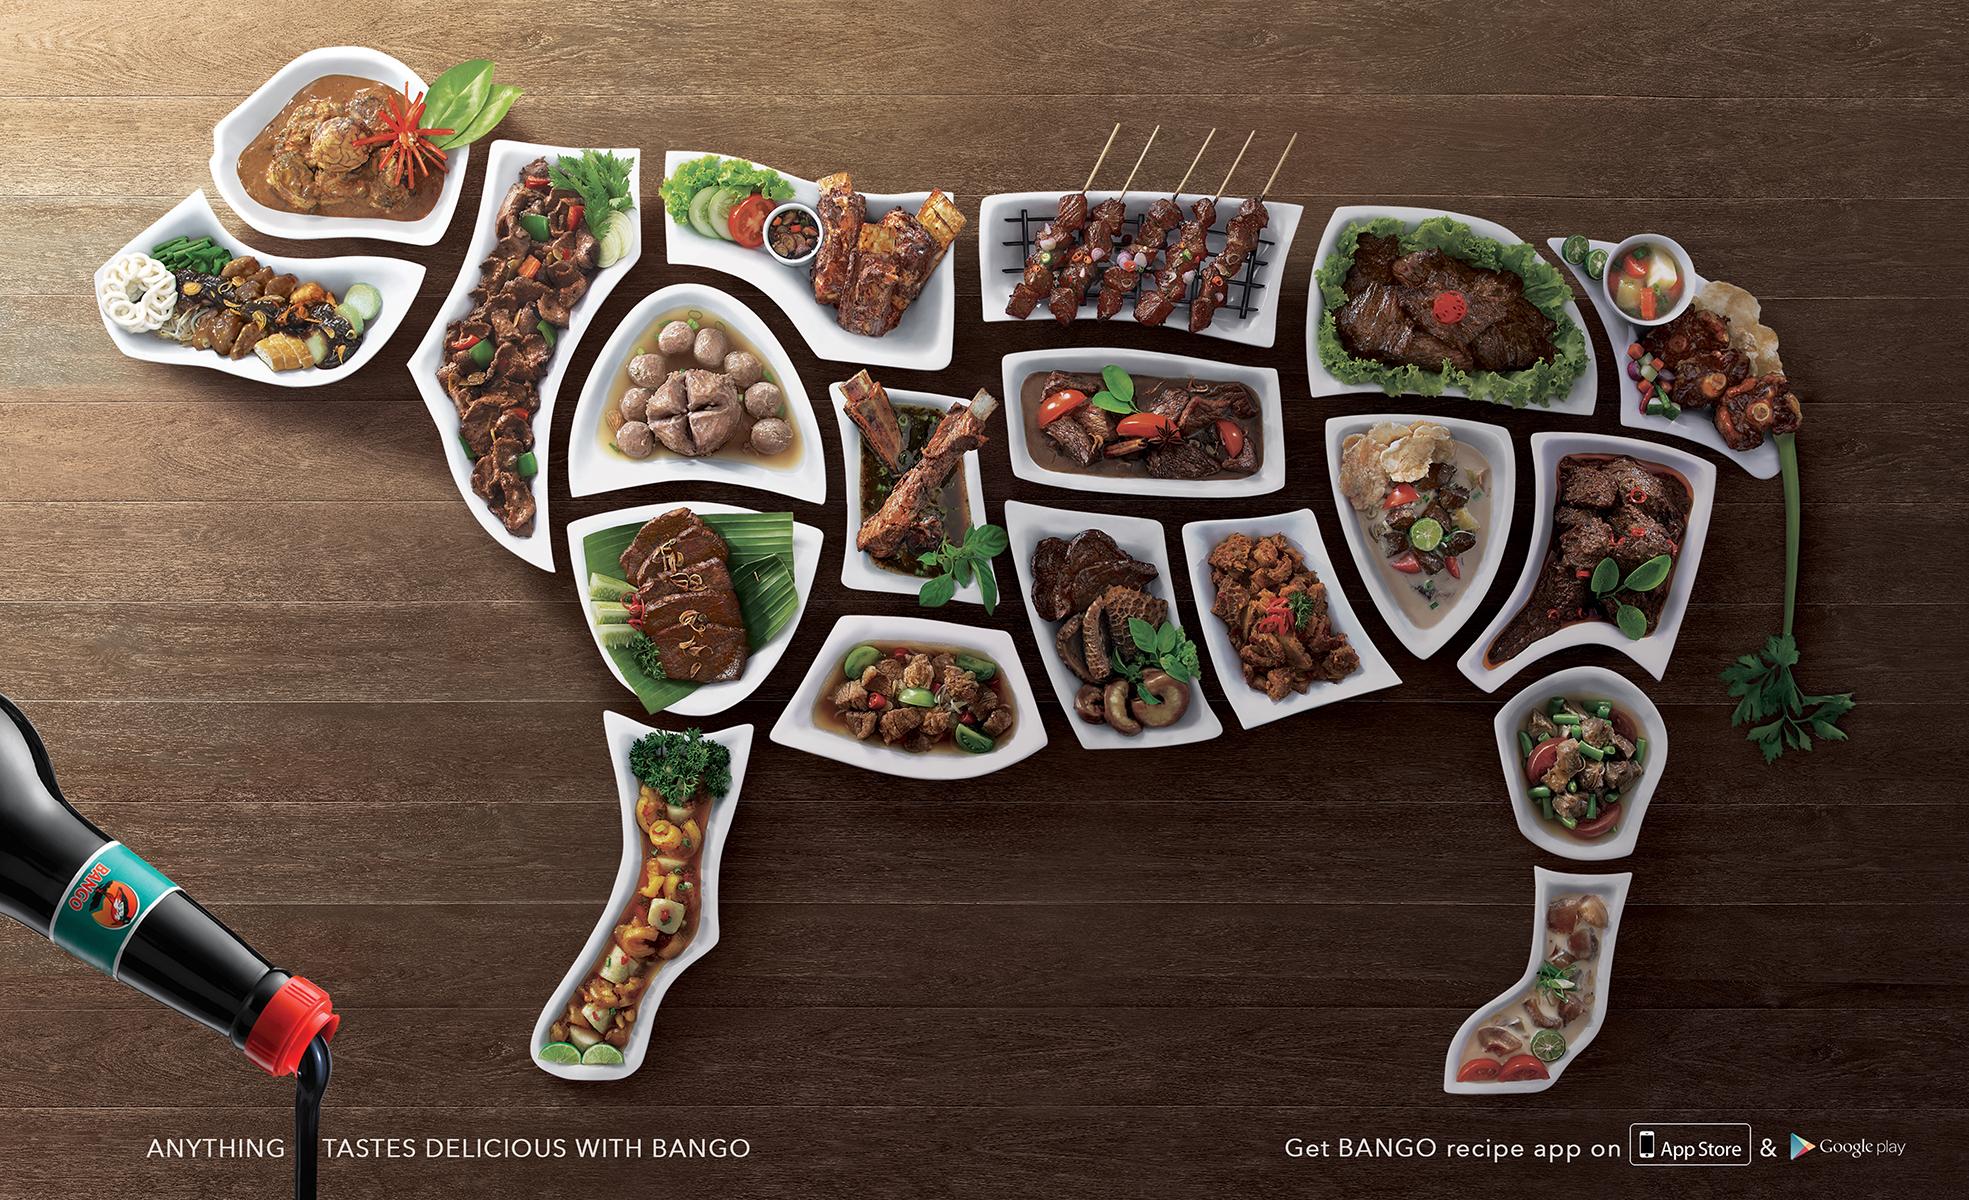 66180_bango meat diagram beef print ad bango bango meat diagram beef